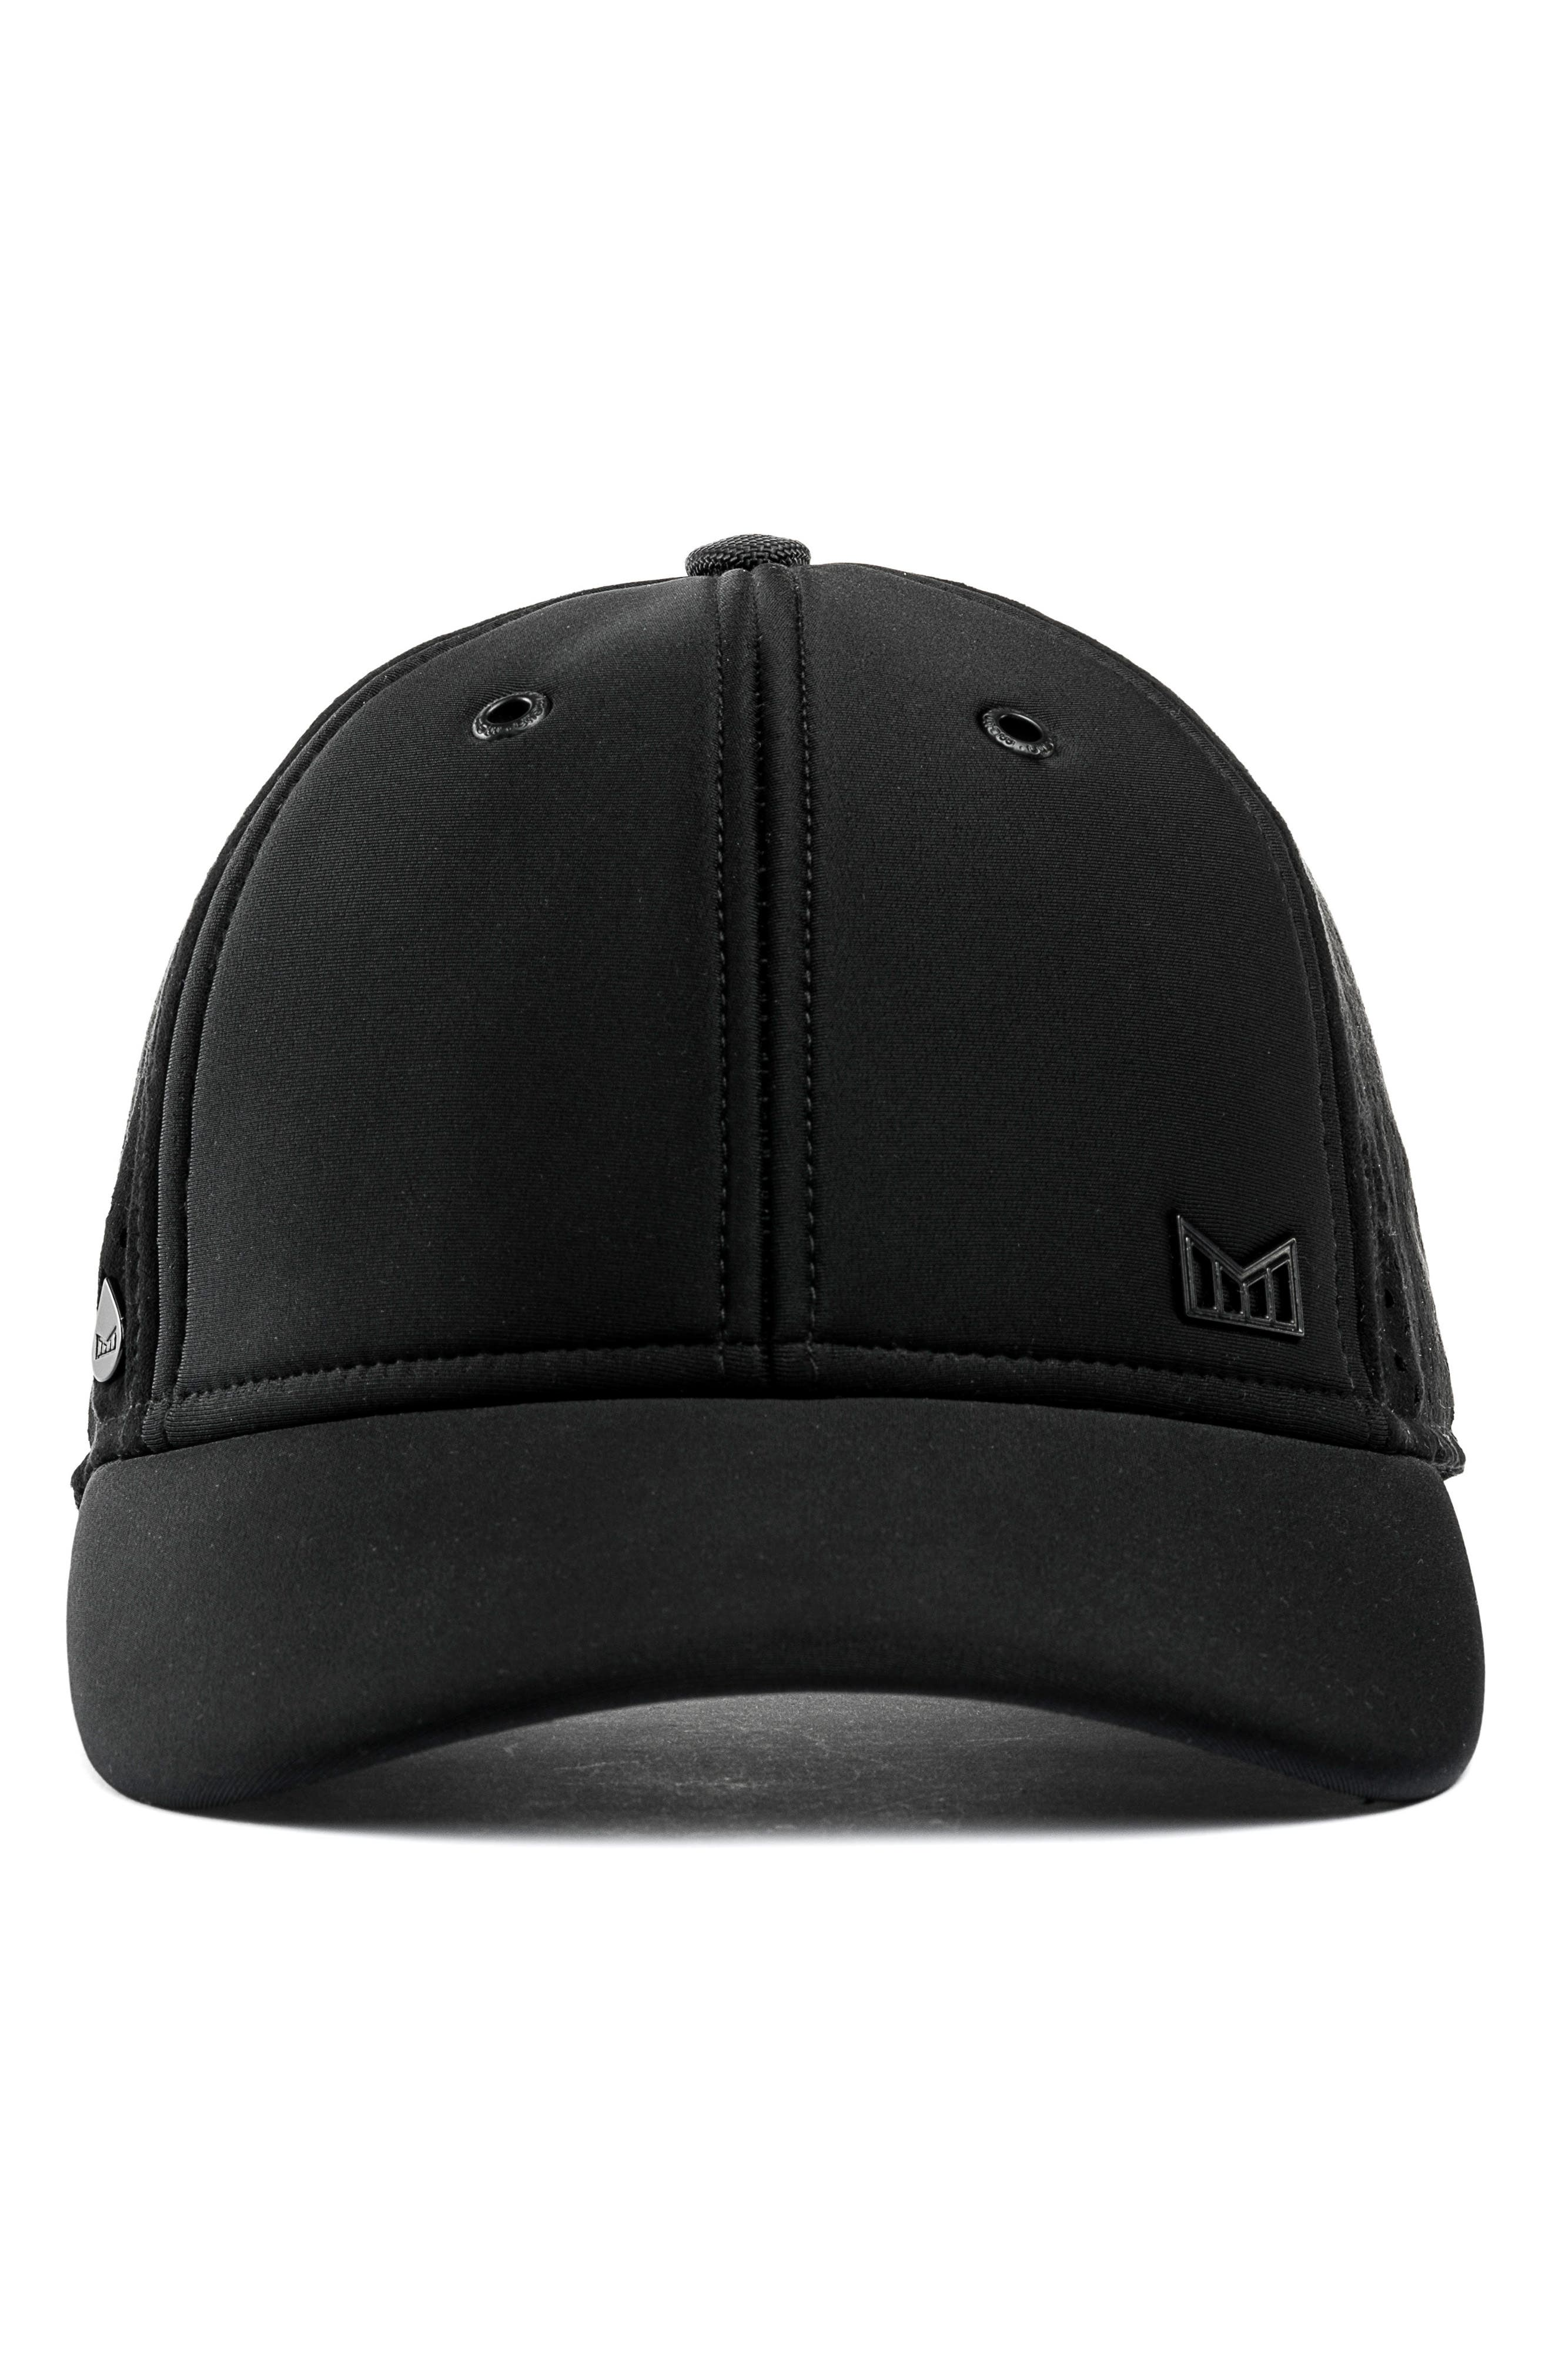 MELIN, Trooper II Snapback Baseball Cap, Alternate thumbnail 2, color, BLACK